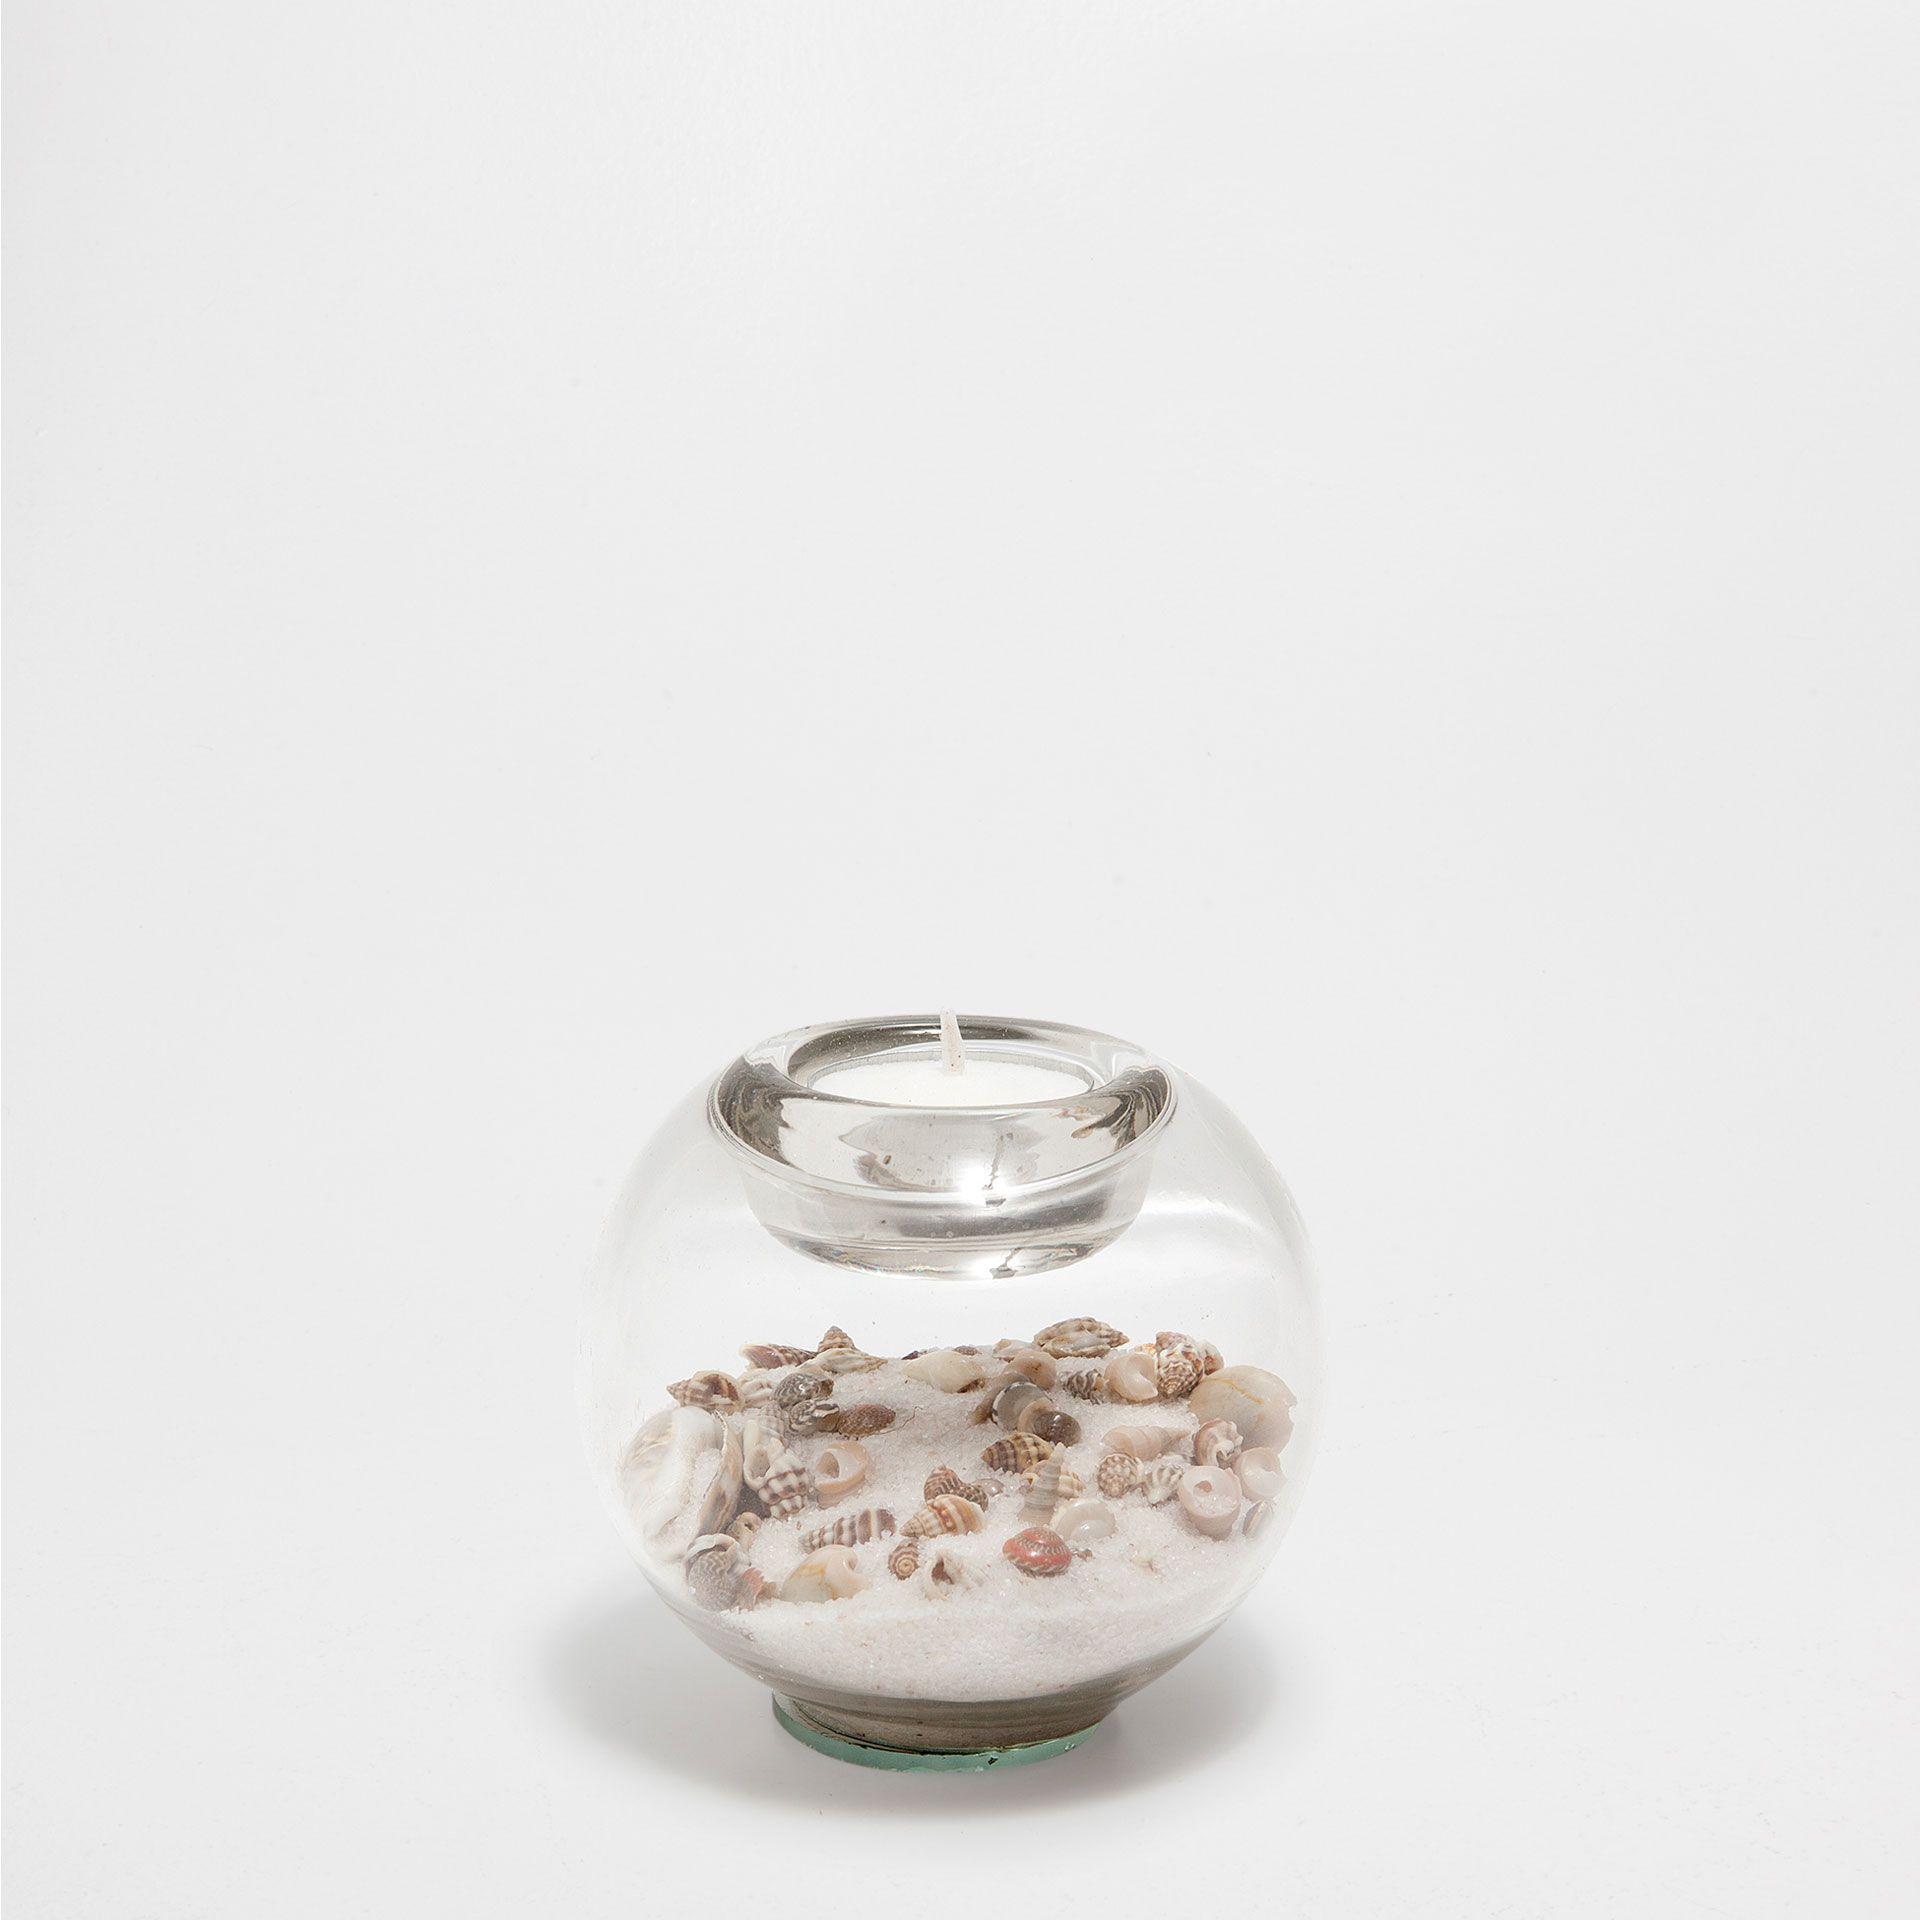 Porte bougie verre coquillages et sable zara home for Decoration porte bougie